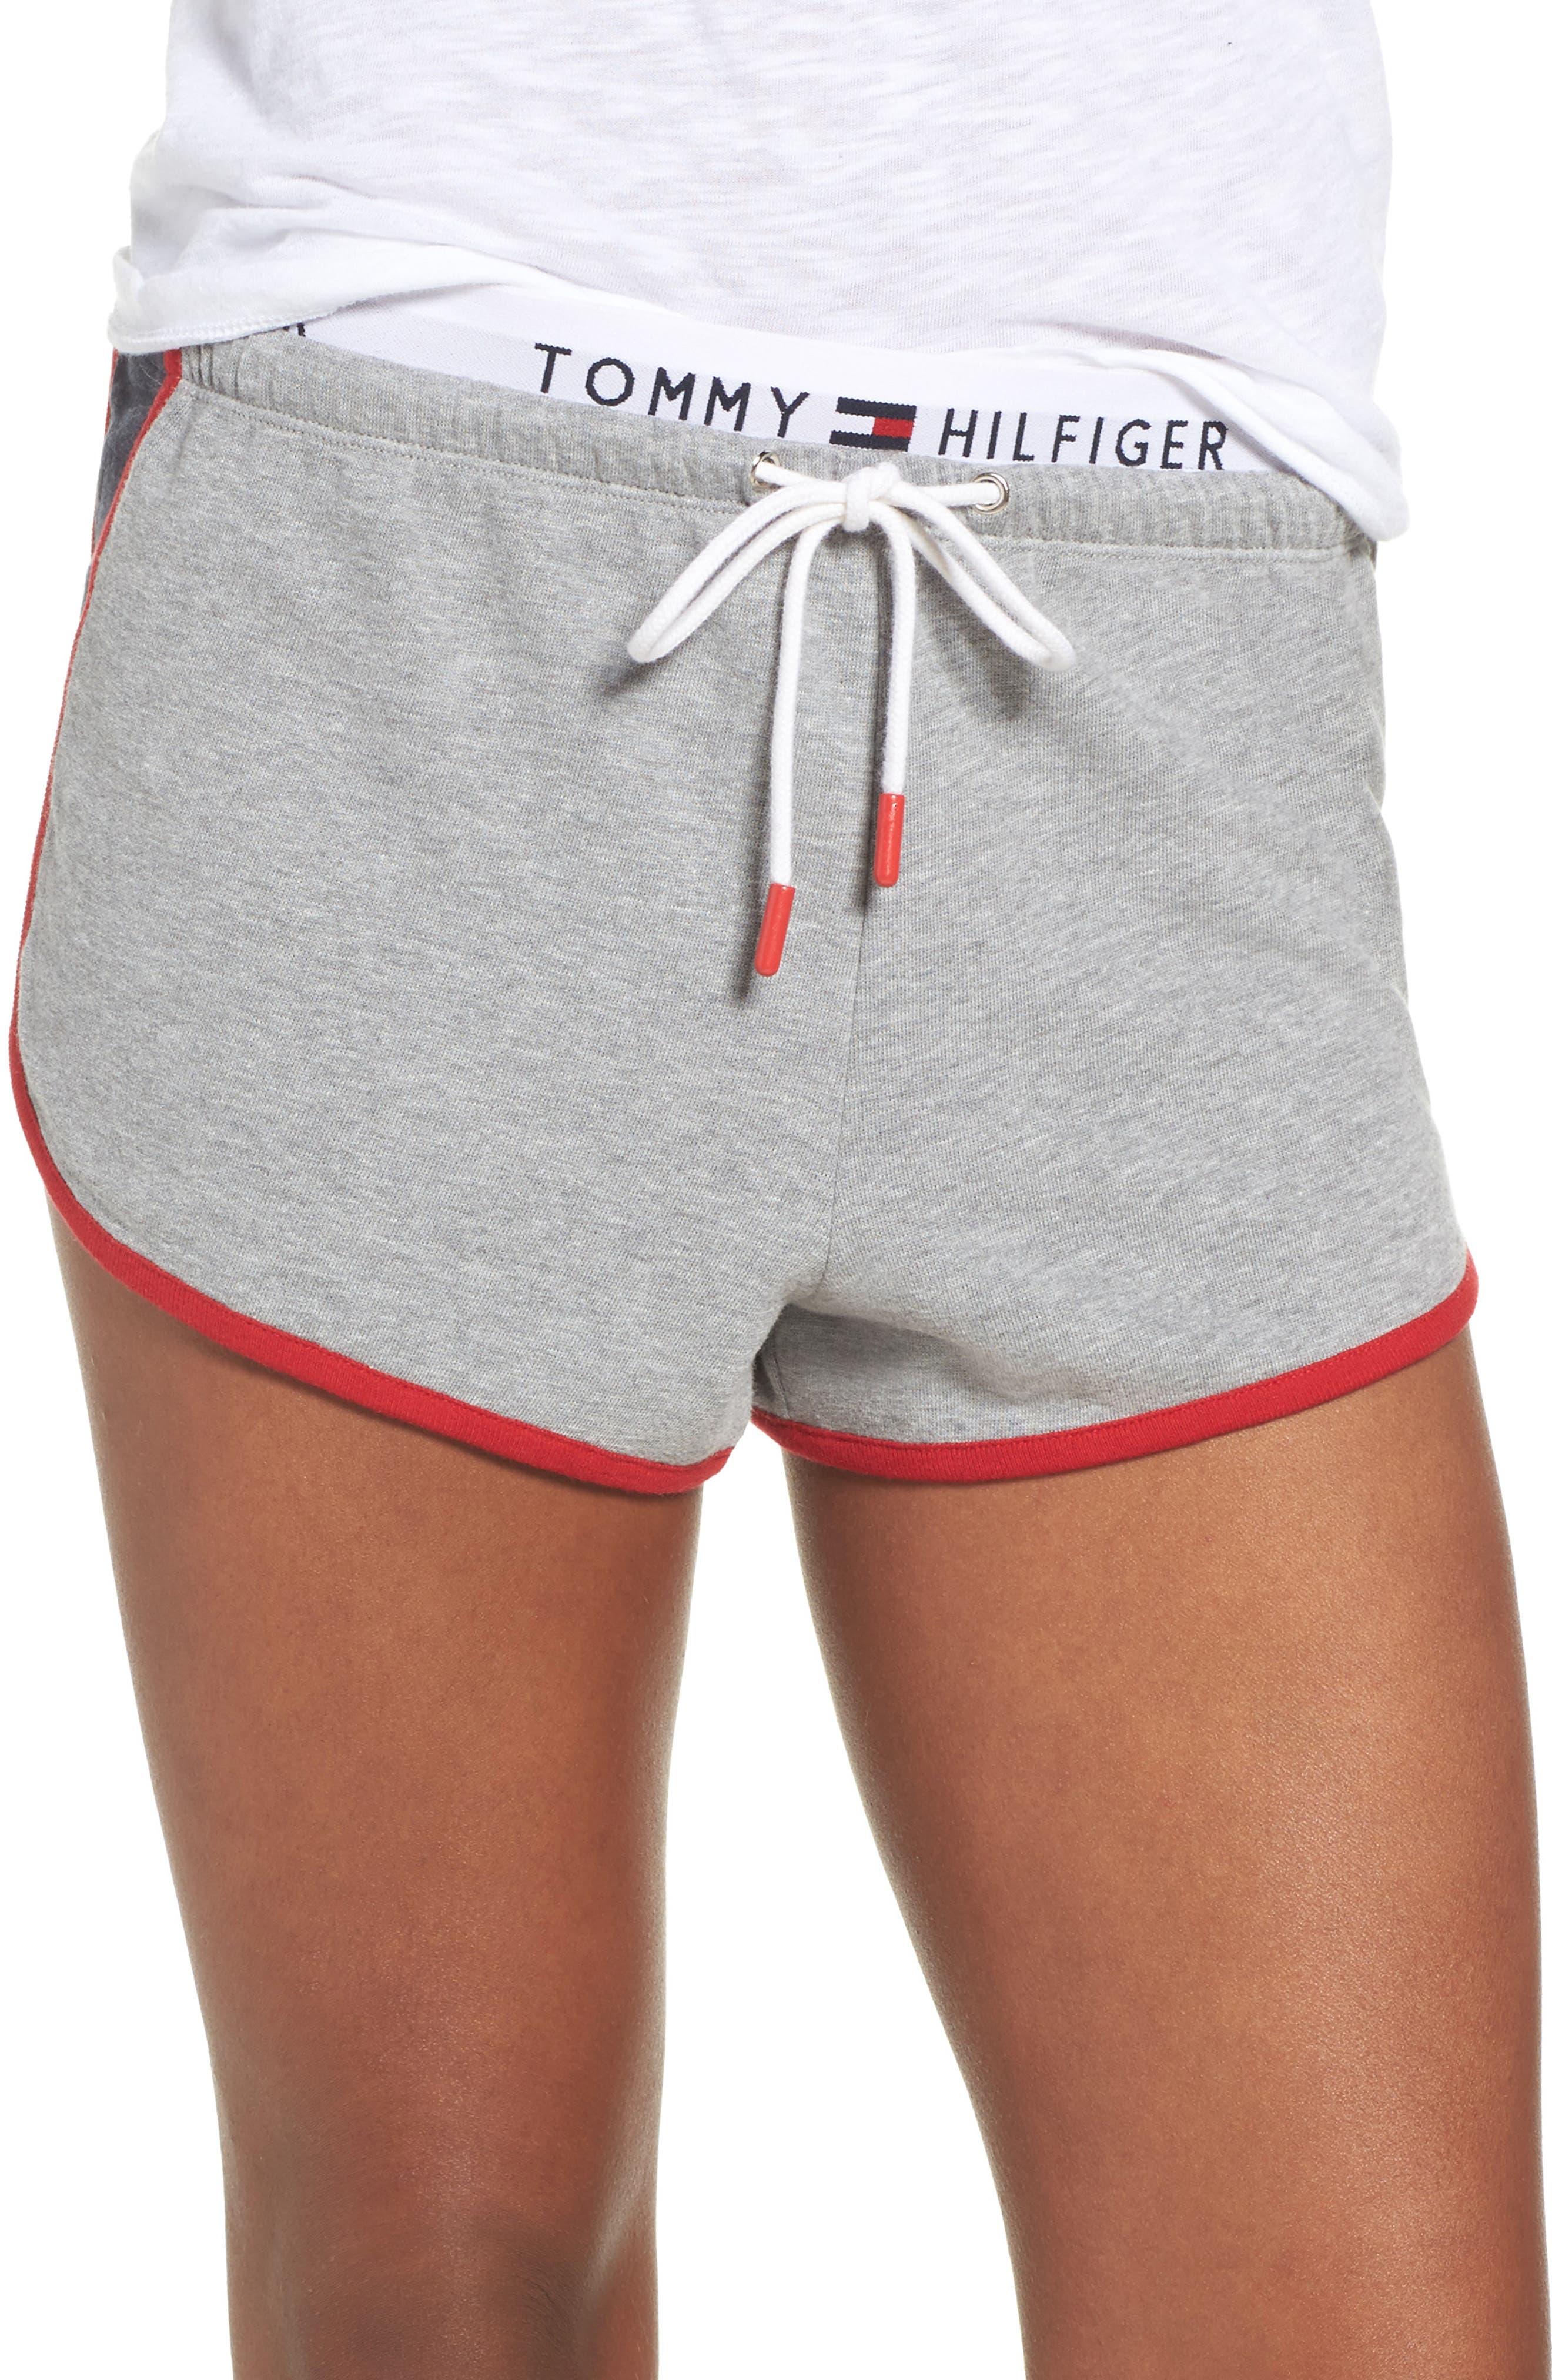 TH Retro Shorts,                         Main,                         color, Heather Gray